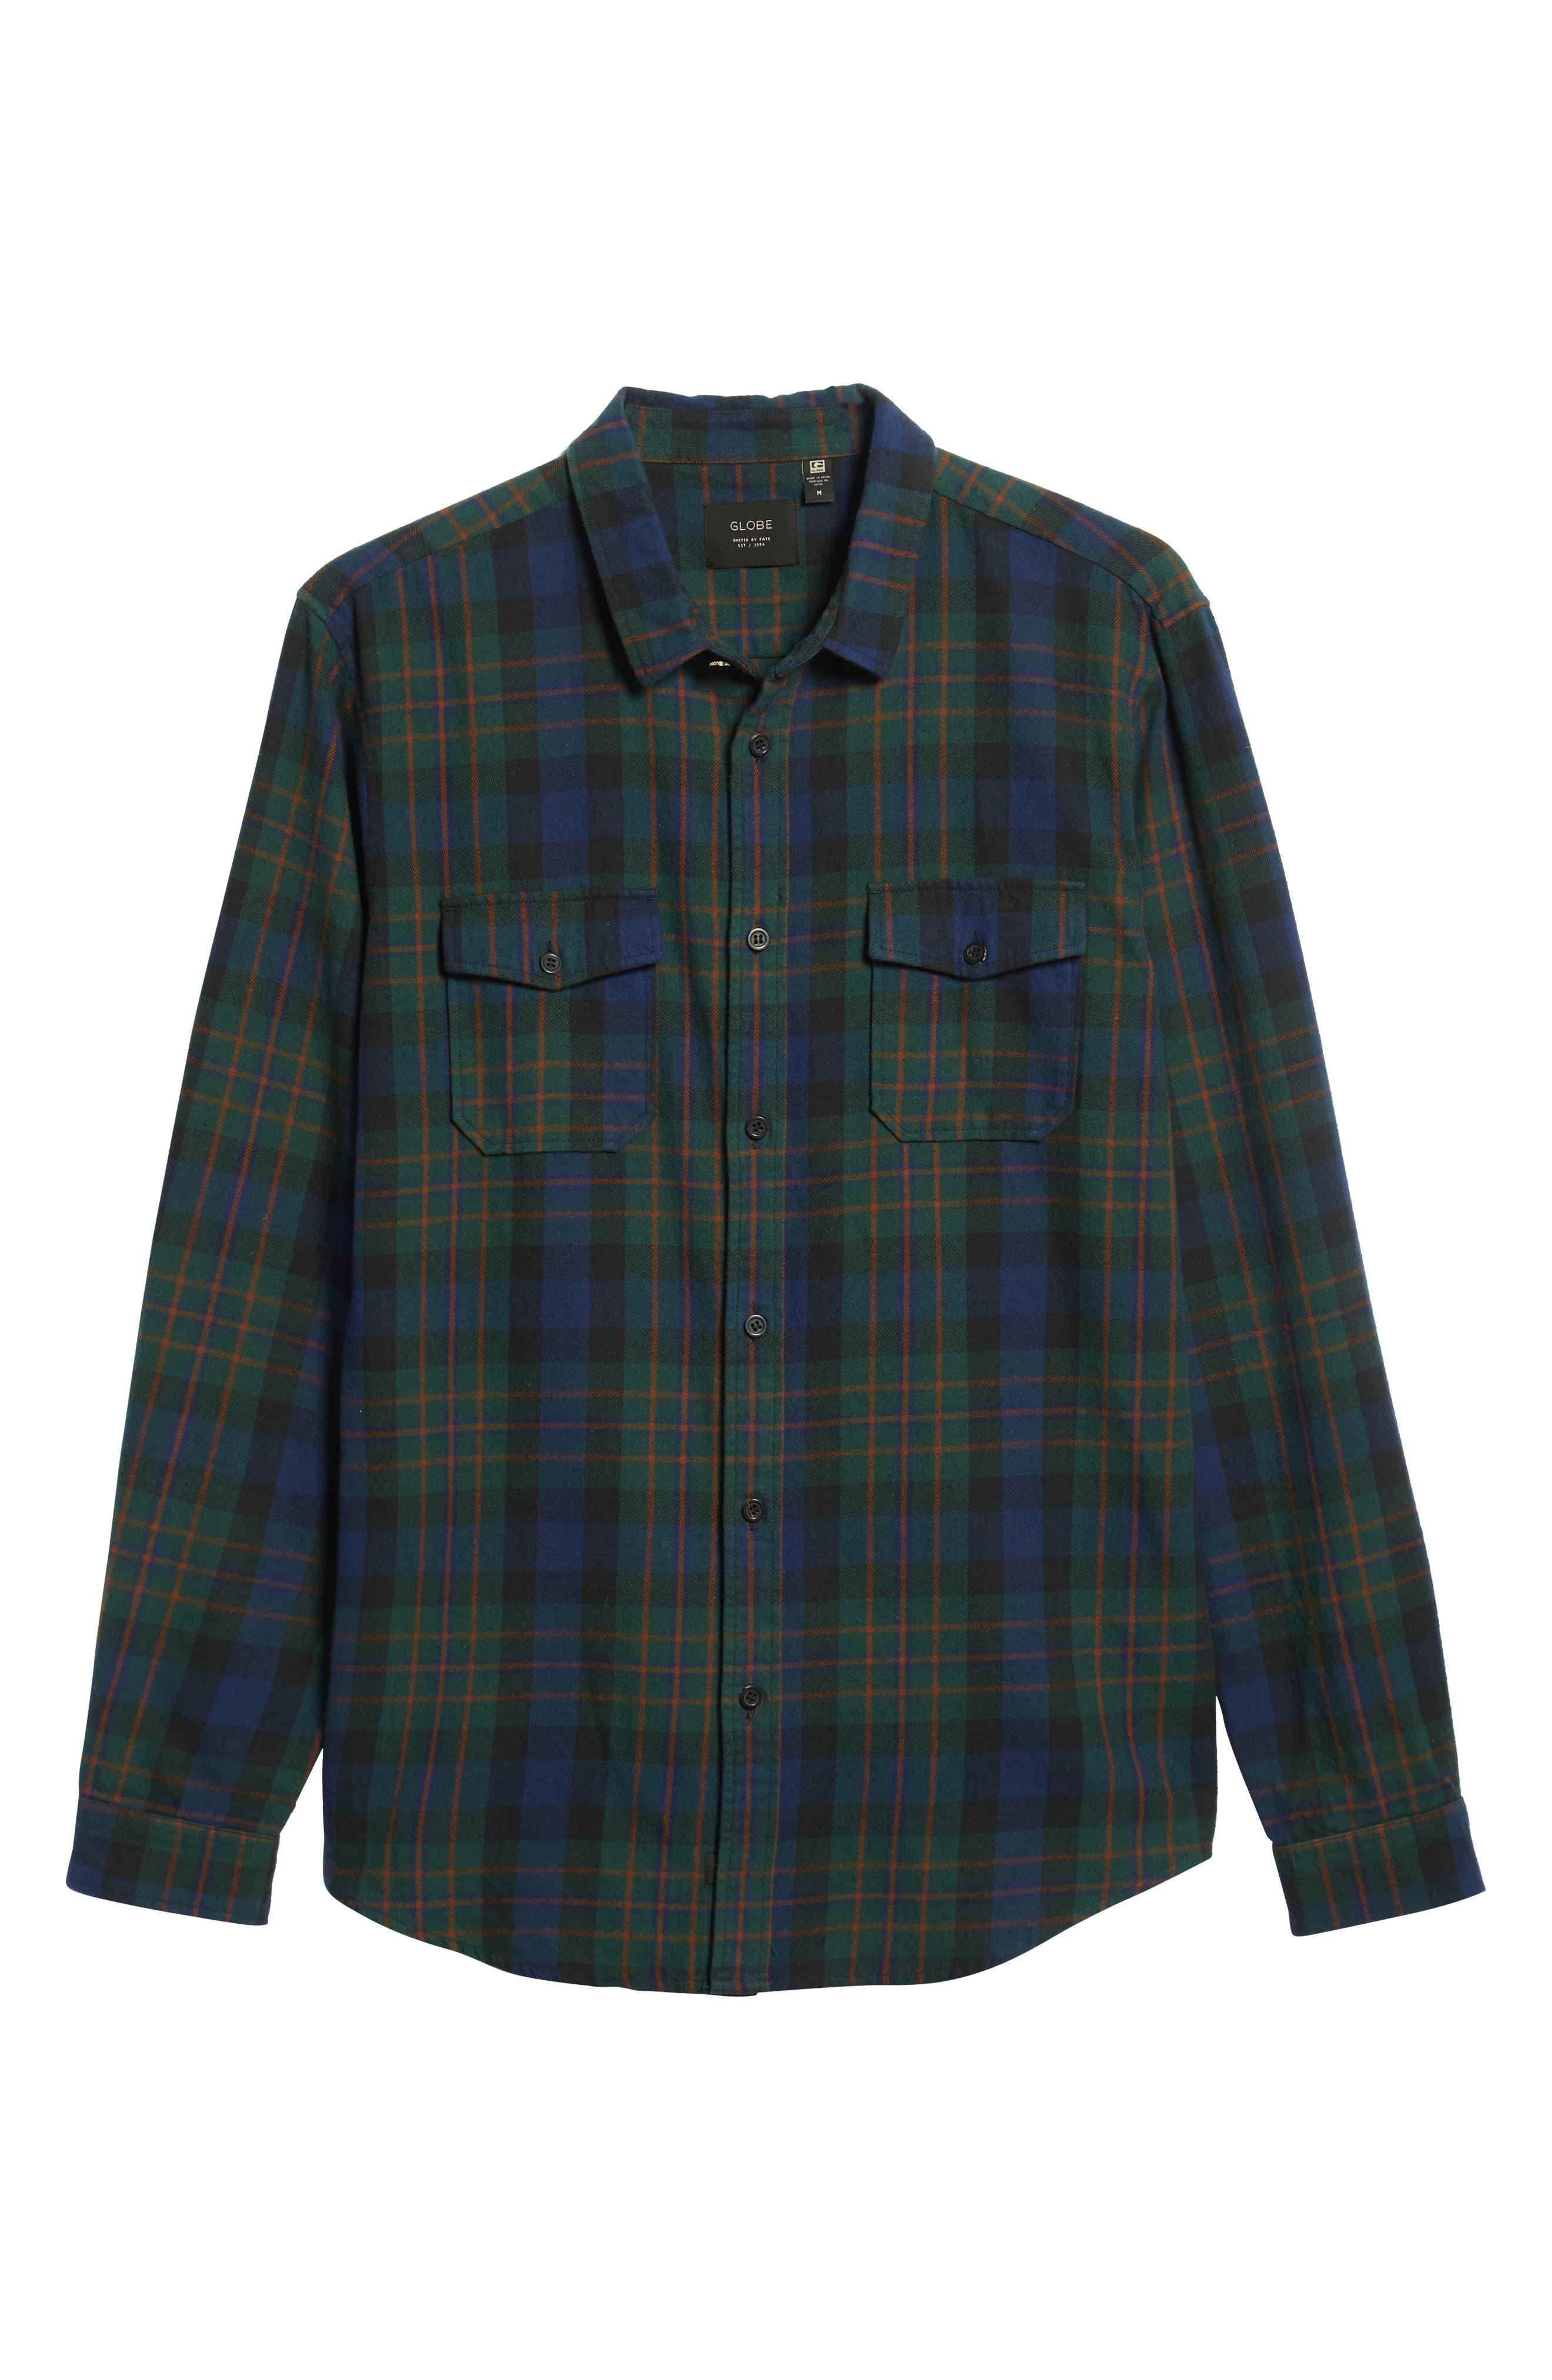 Flanigan Woven Shirt,                             Alternate thumbnail 6, color,                             BOTTLE GREEN